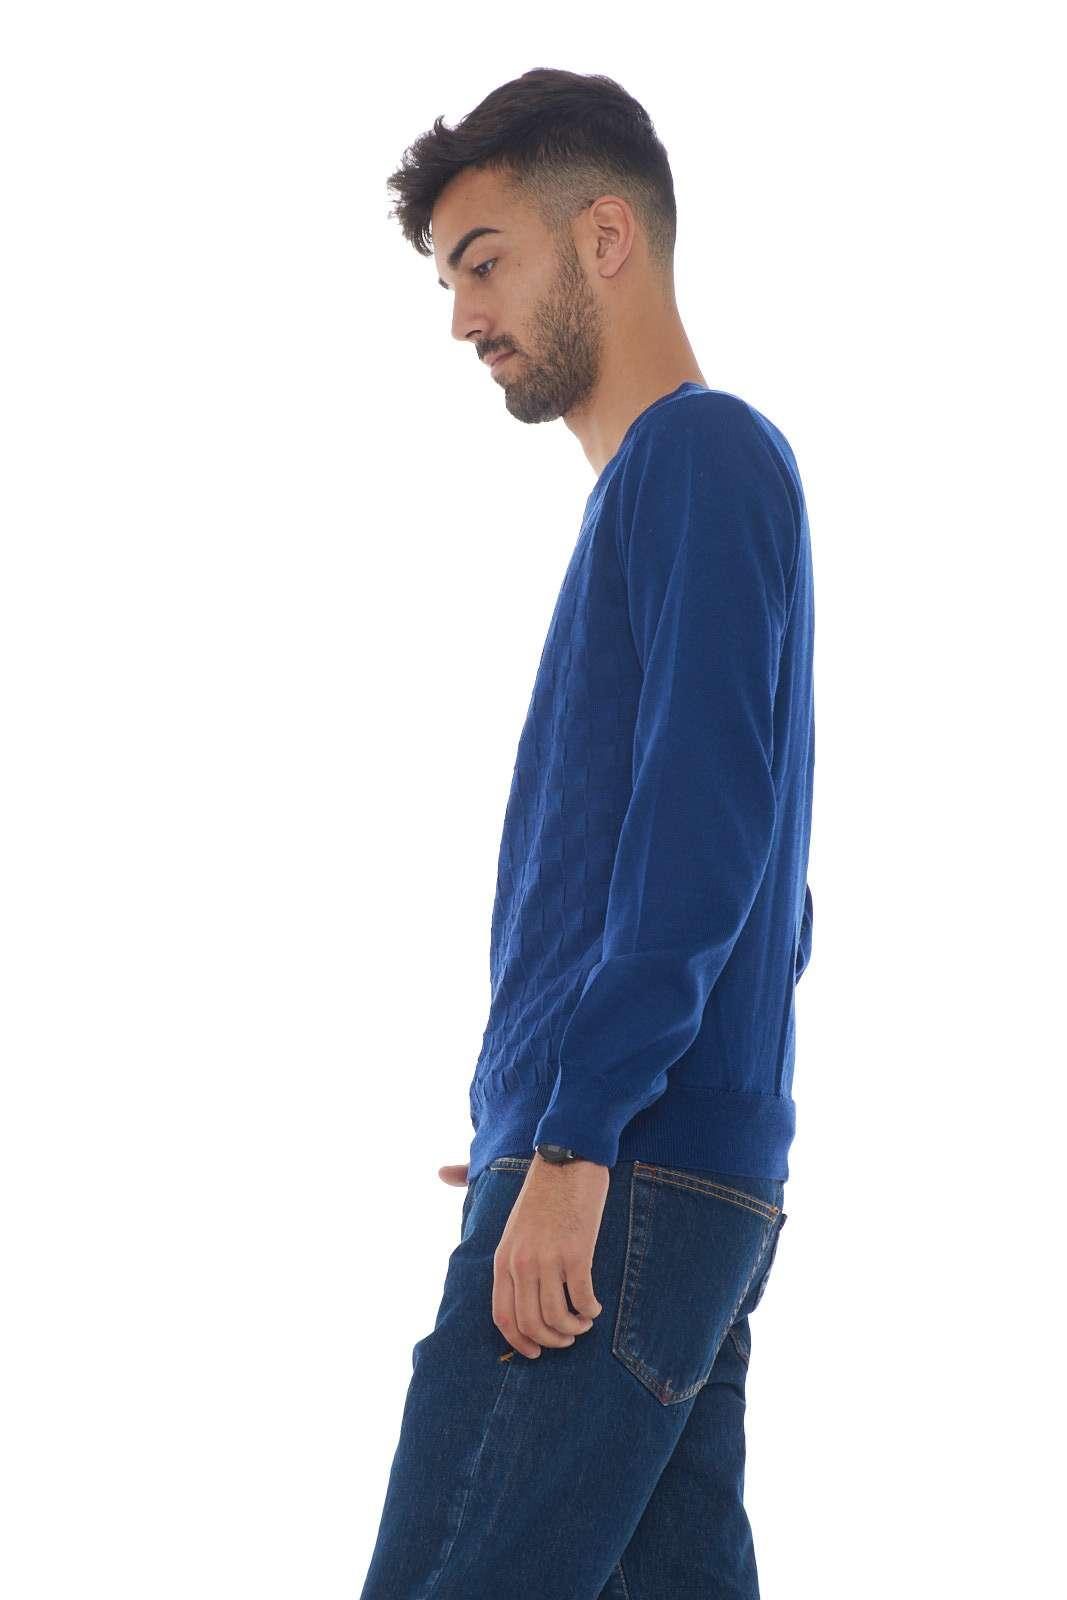 https://www.parmax.com/media/catalog/product/a/i/AI-outlet_parmax-maglia-uomo-Acquapura-007-B.jpg